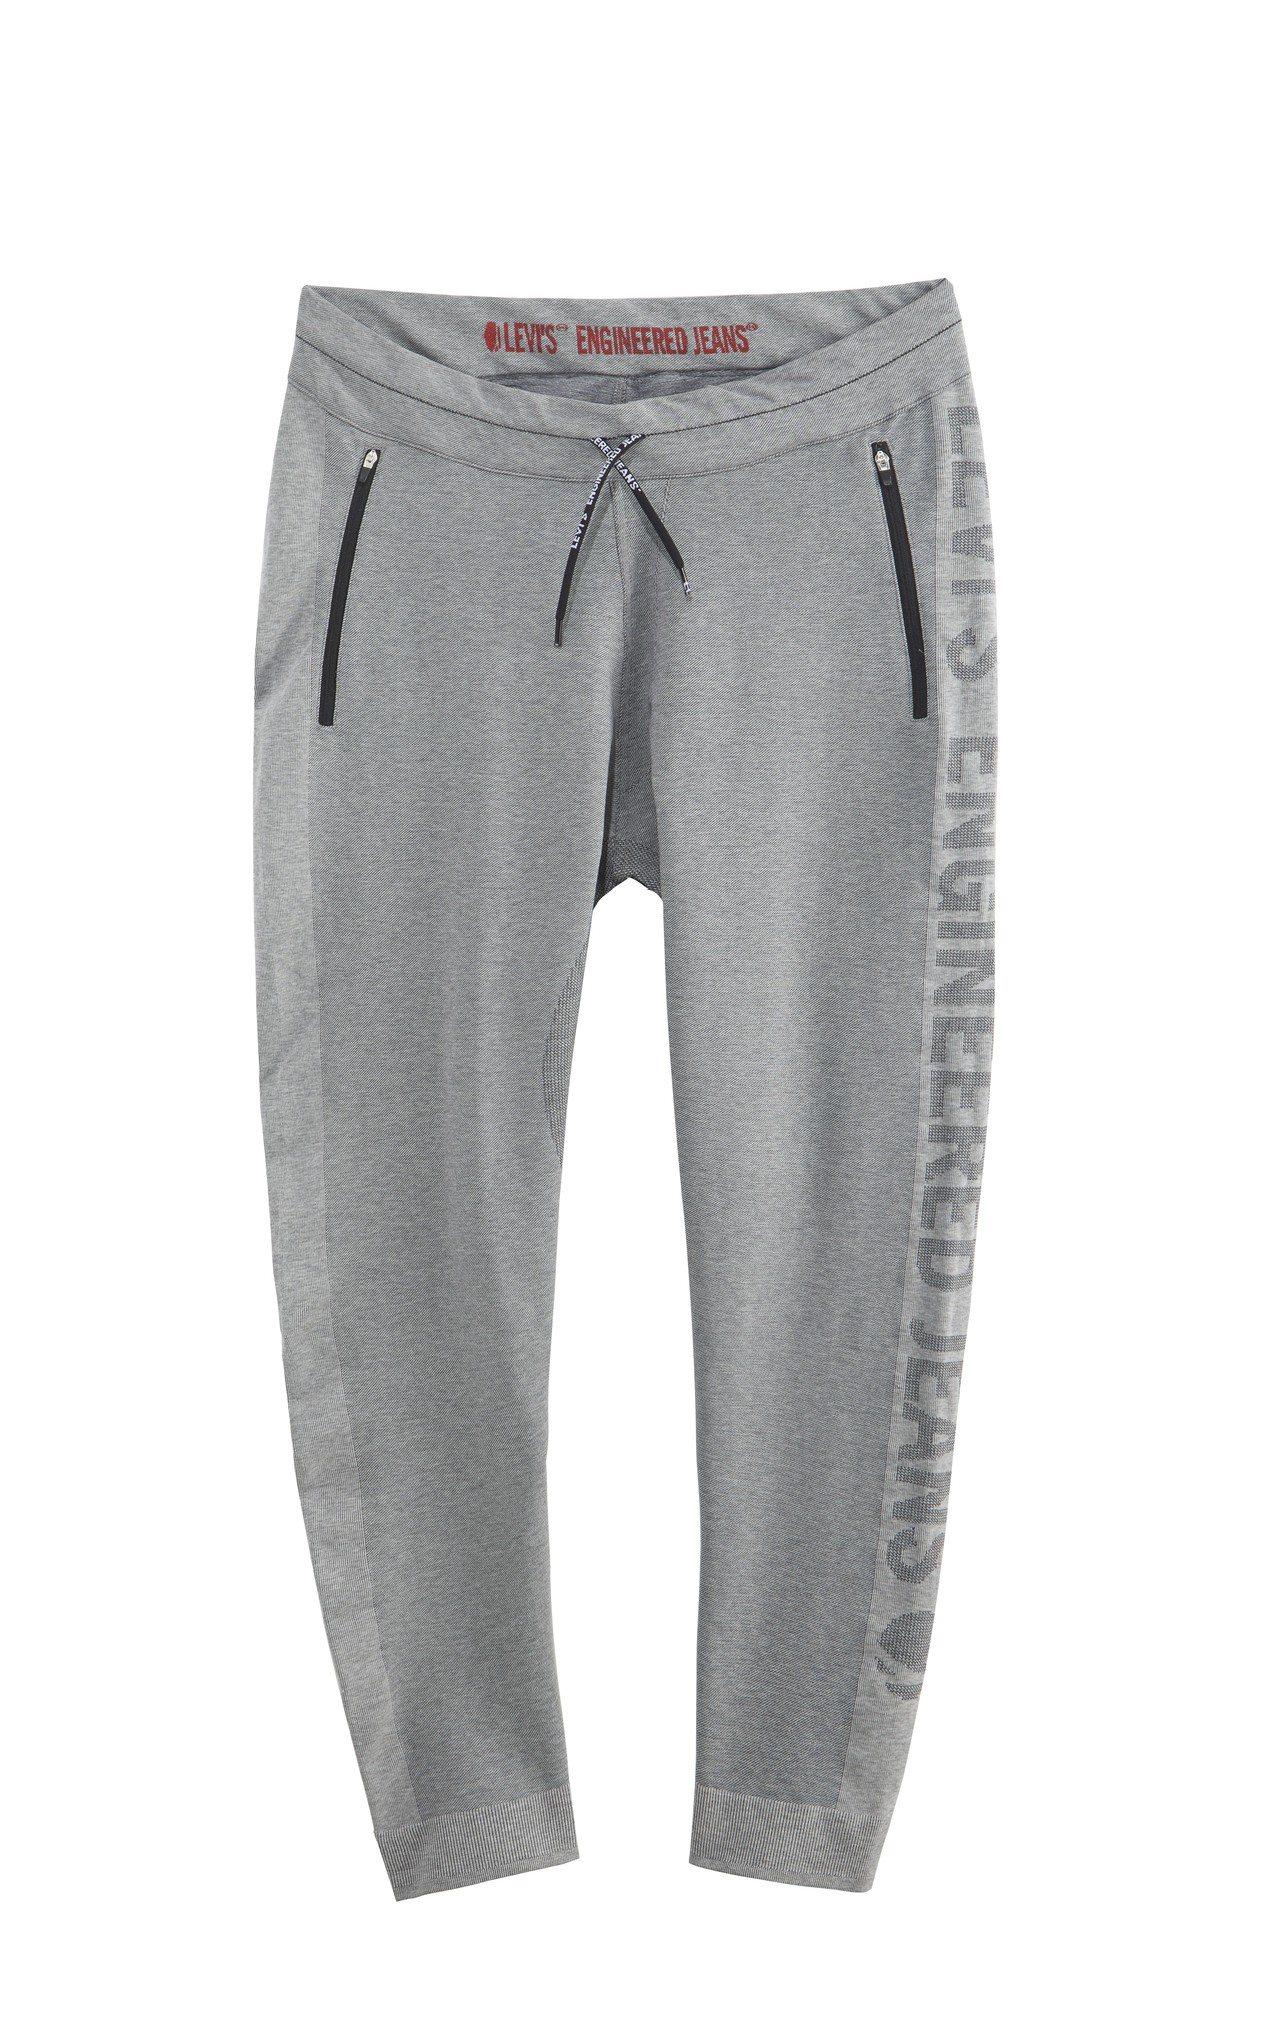 LEJ針織灰色運動褲,3490元。圖/LEVIS提供